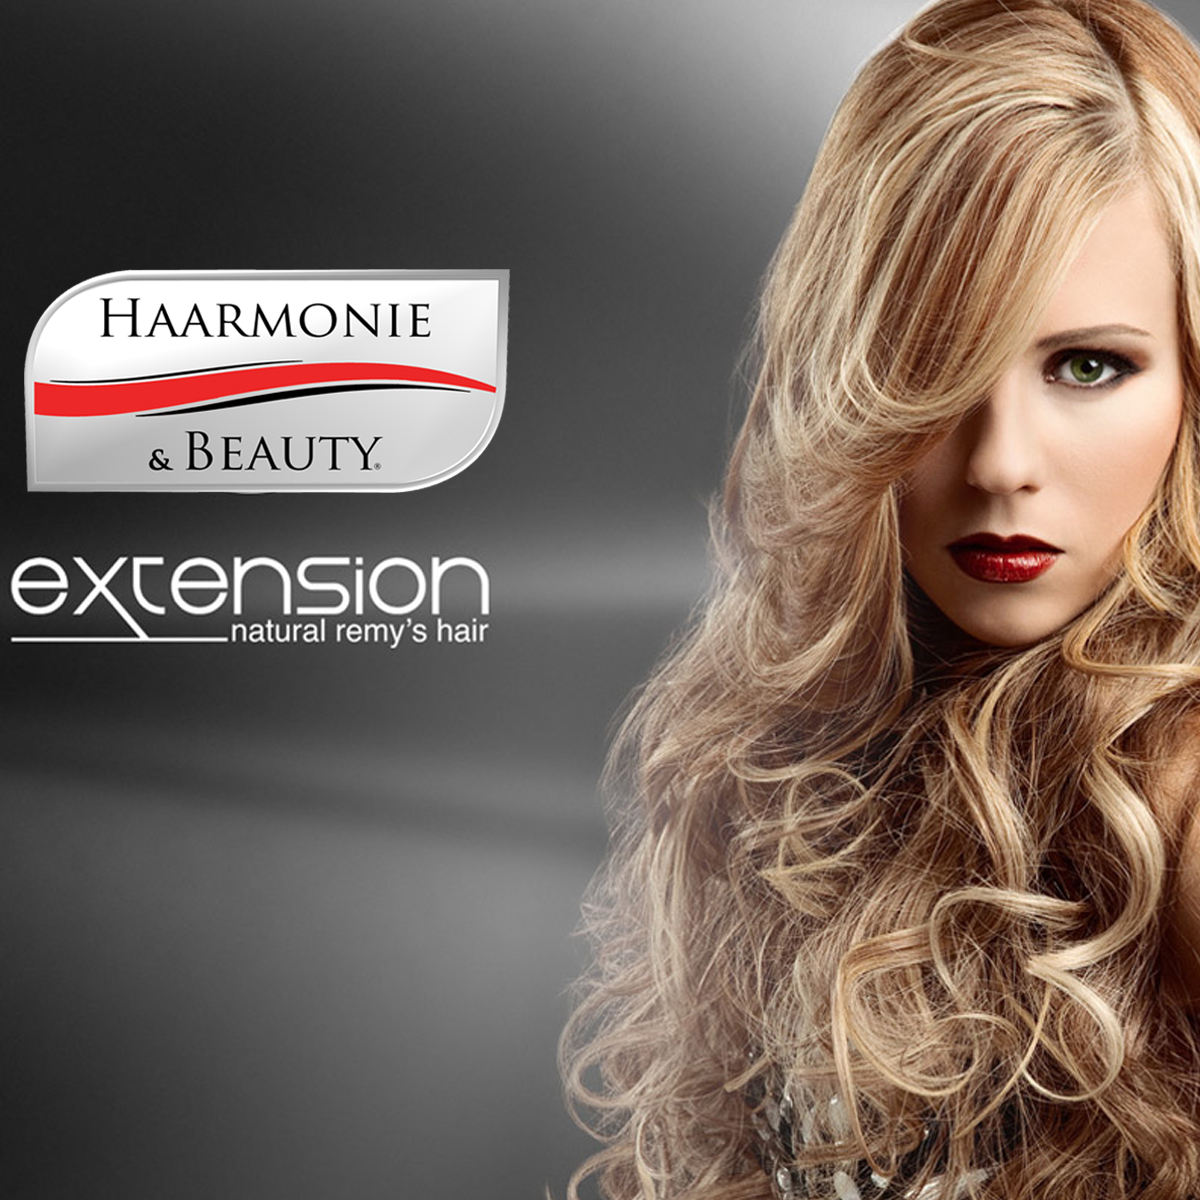 Annes Friseur Haarmonie & Beauty